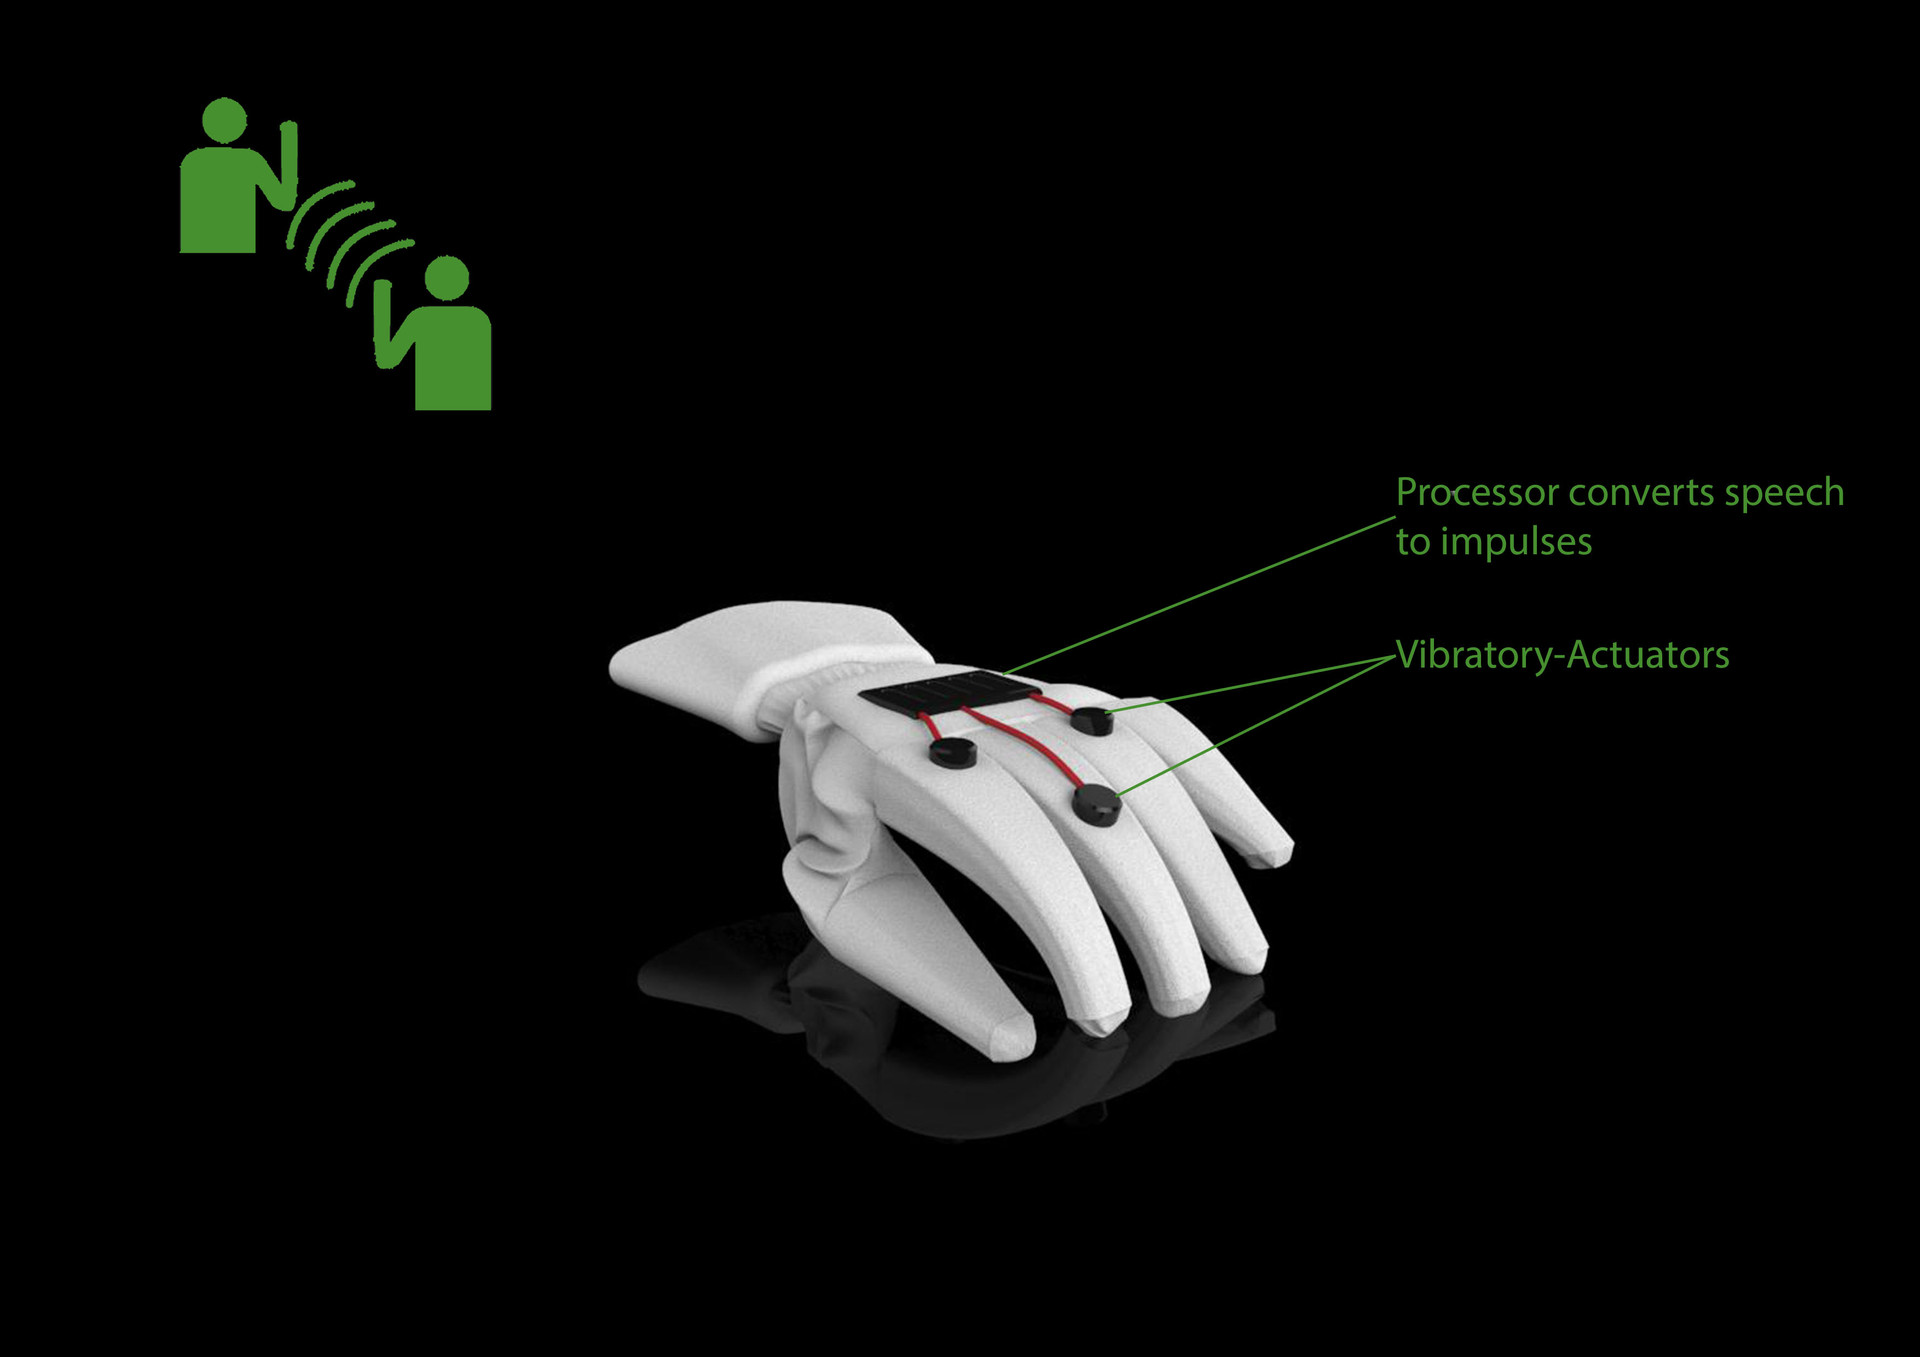 Vibro-Tactile Communication5